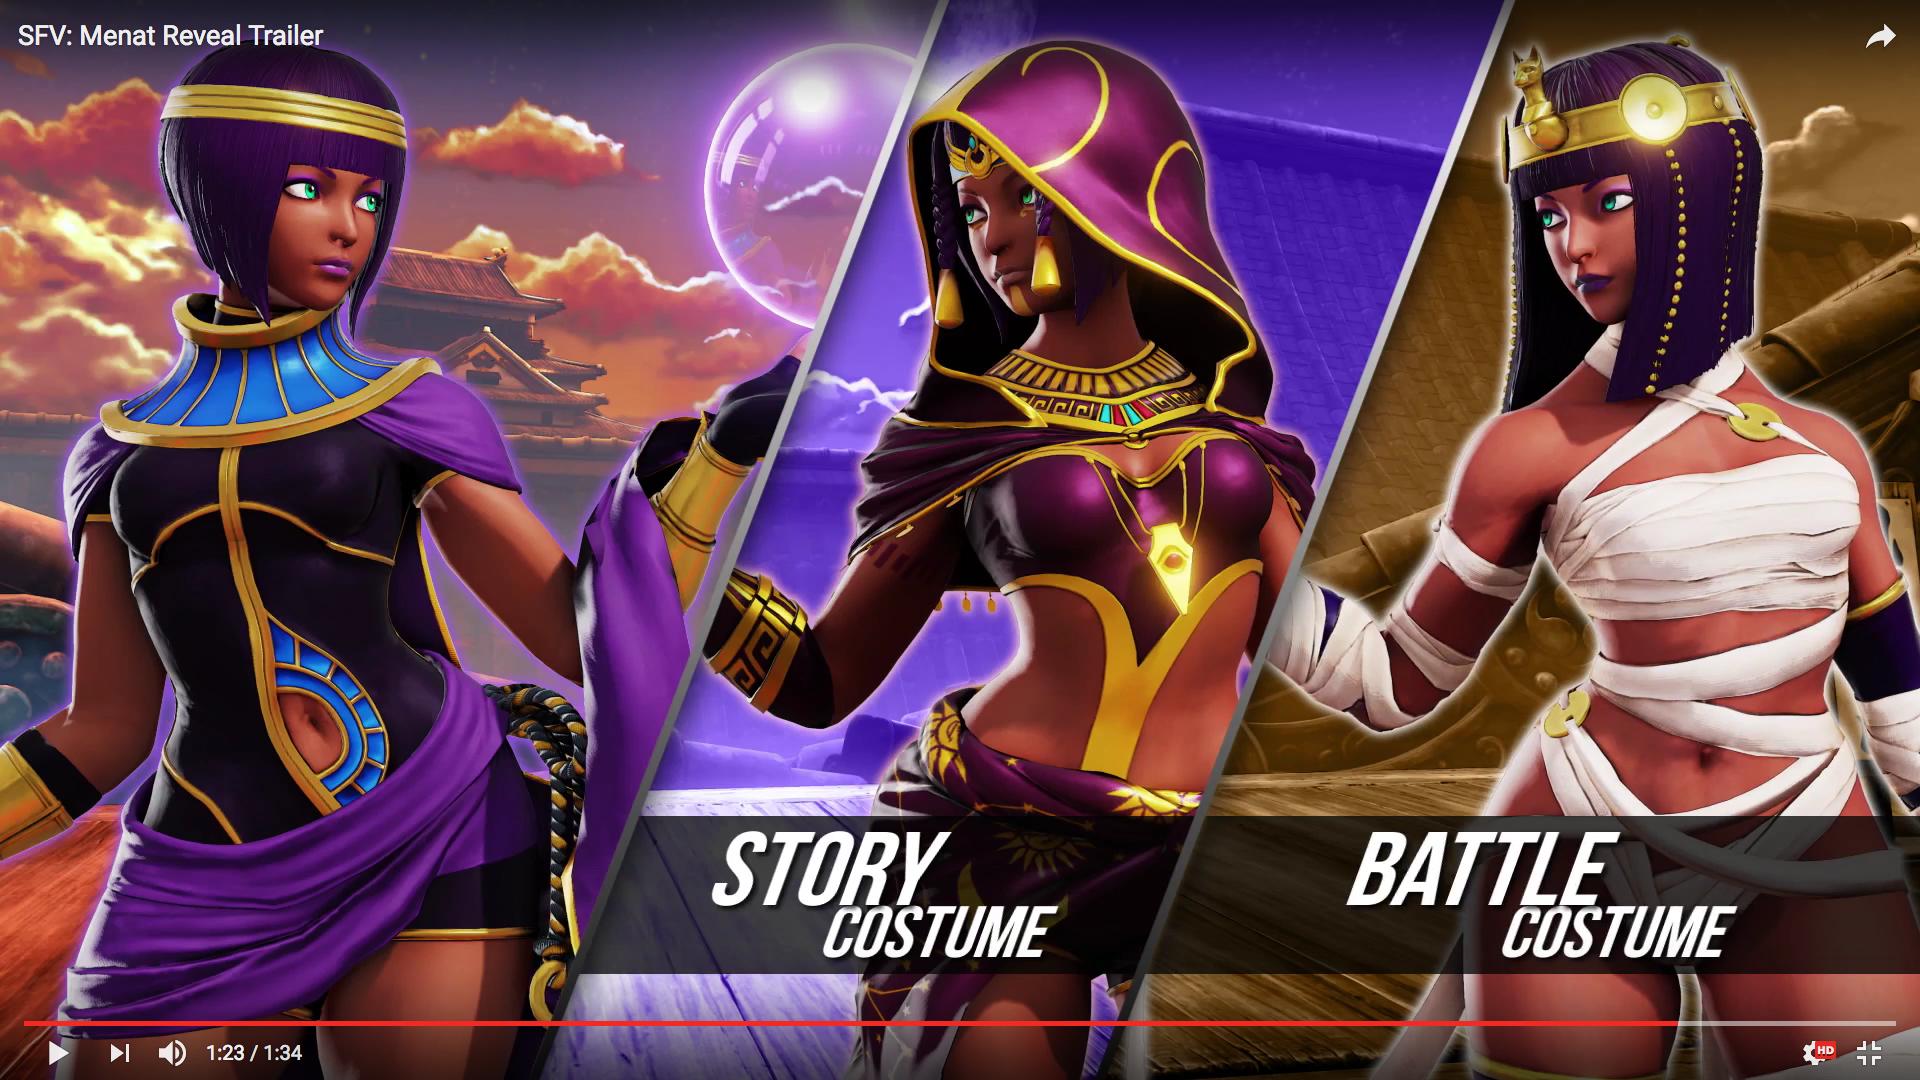 Street Fighter V Menat Trailer Neogaf New Street Fighter